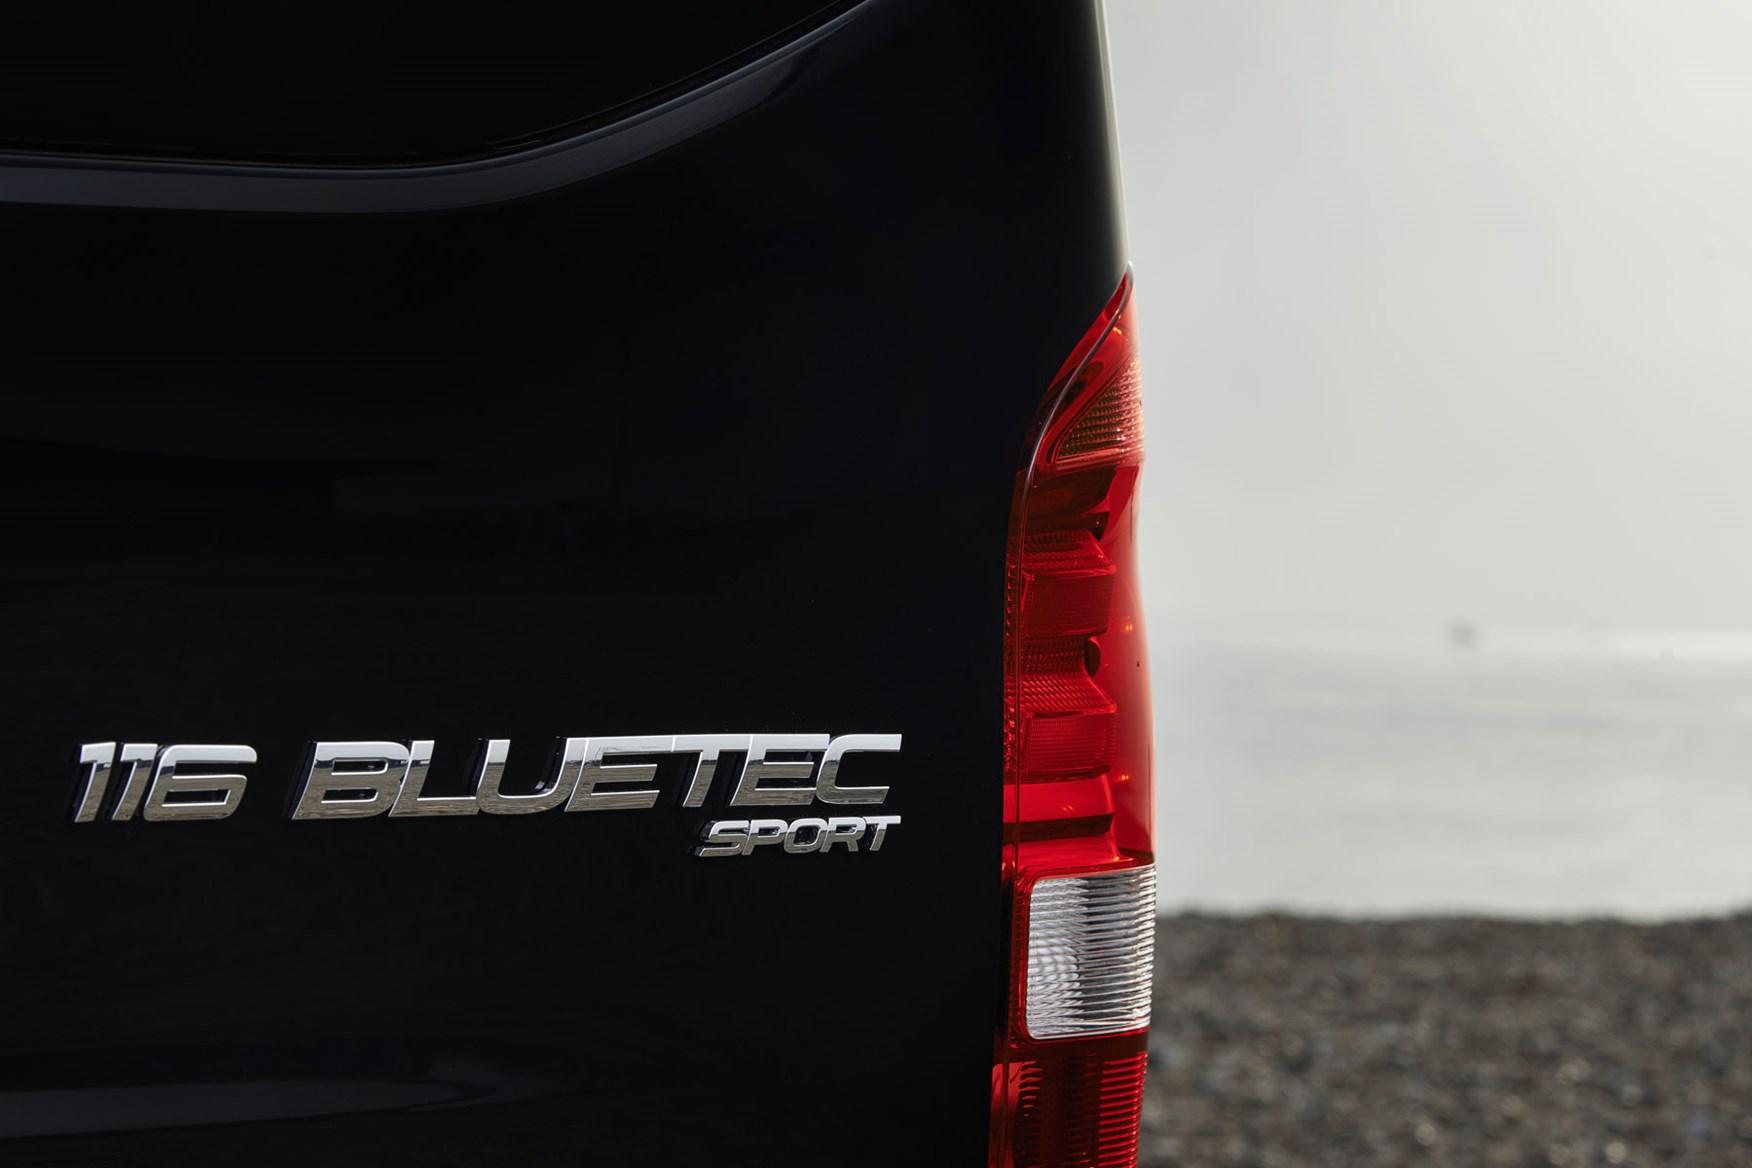 Mercedes-Benz Vito Sport review - Sport badge